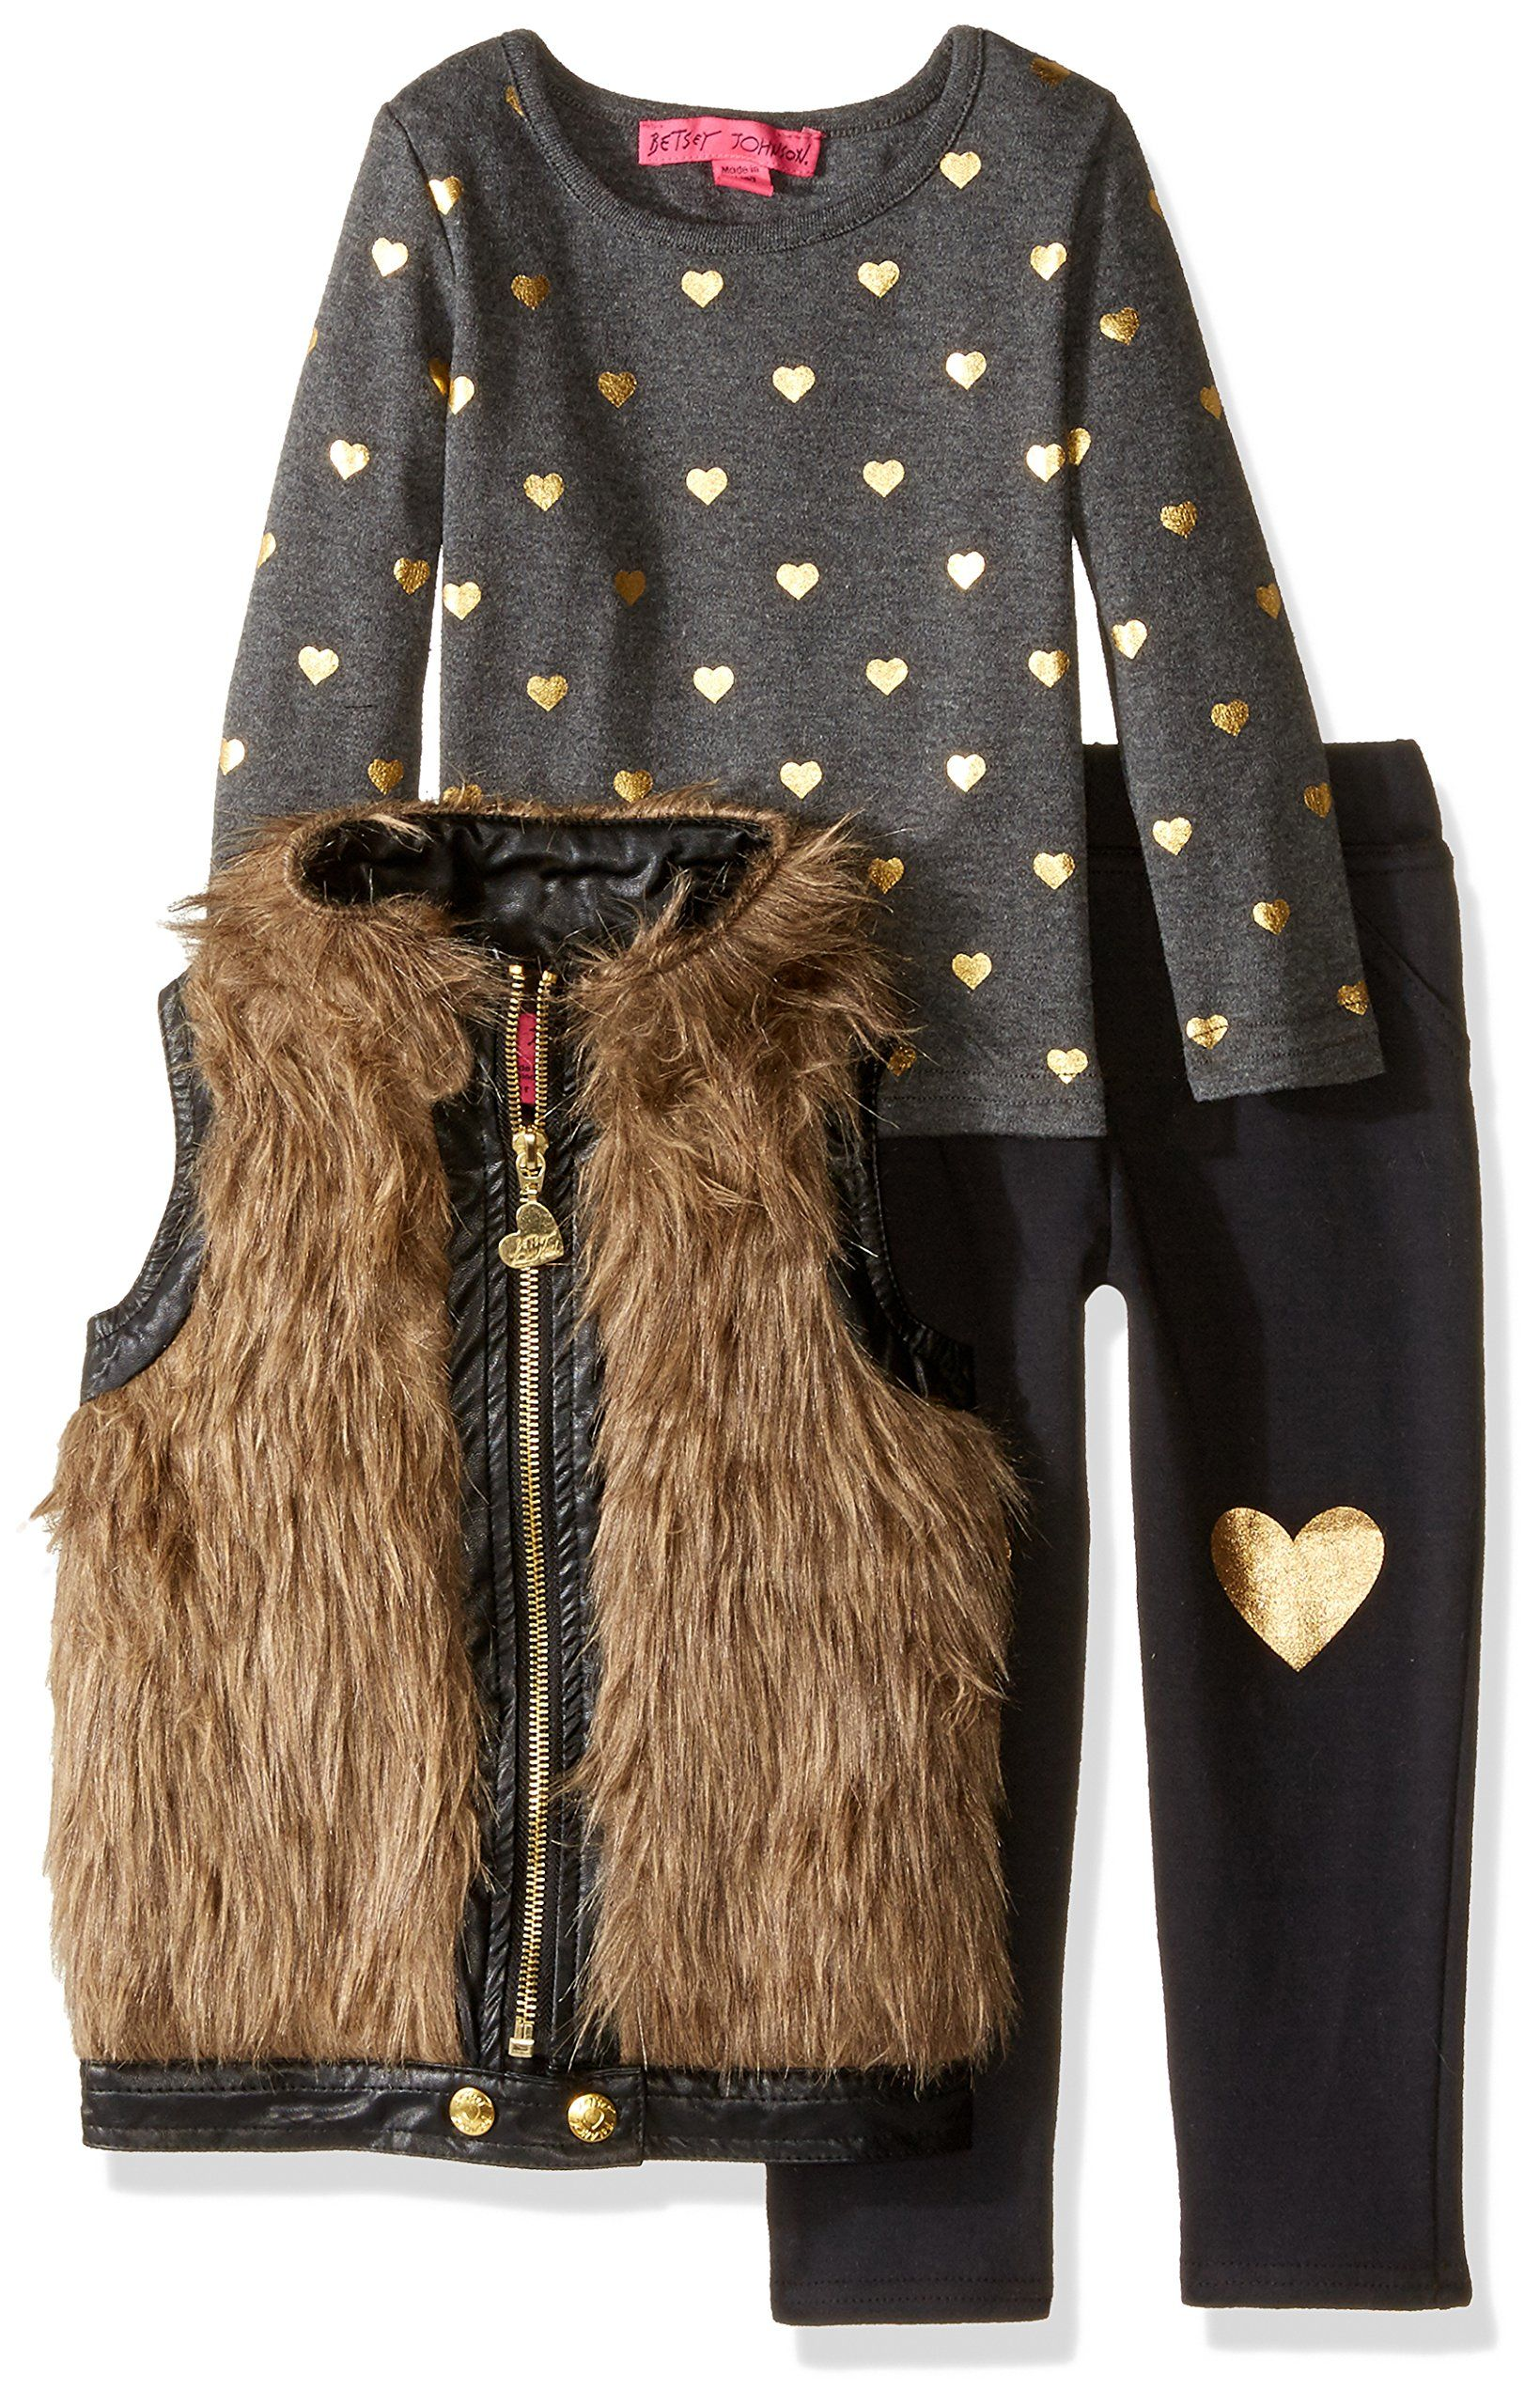 df19bc28fa2c Betsey Johnson Little Girls  Toddler 3 Piece Metallic Vest Set ...